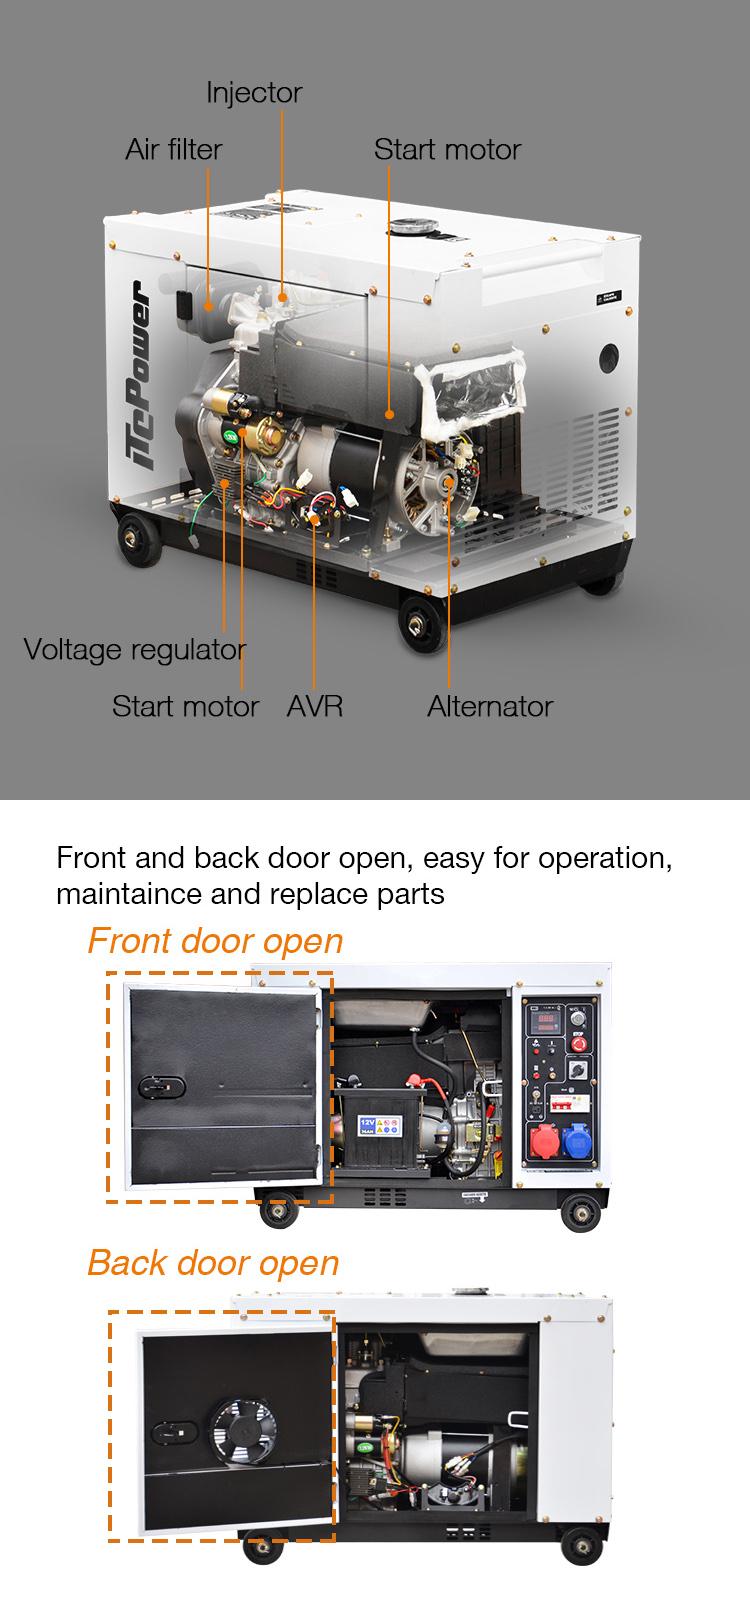 Air cooled 5KW ITC - แบบพกพาเครื่องกำเนิดไฟฟ้าดีเซลเงียบเครื่องกำเนิดไฟฟ้าดีเซล